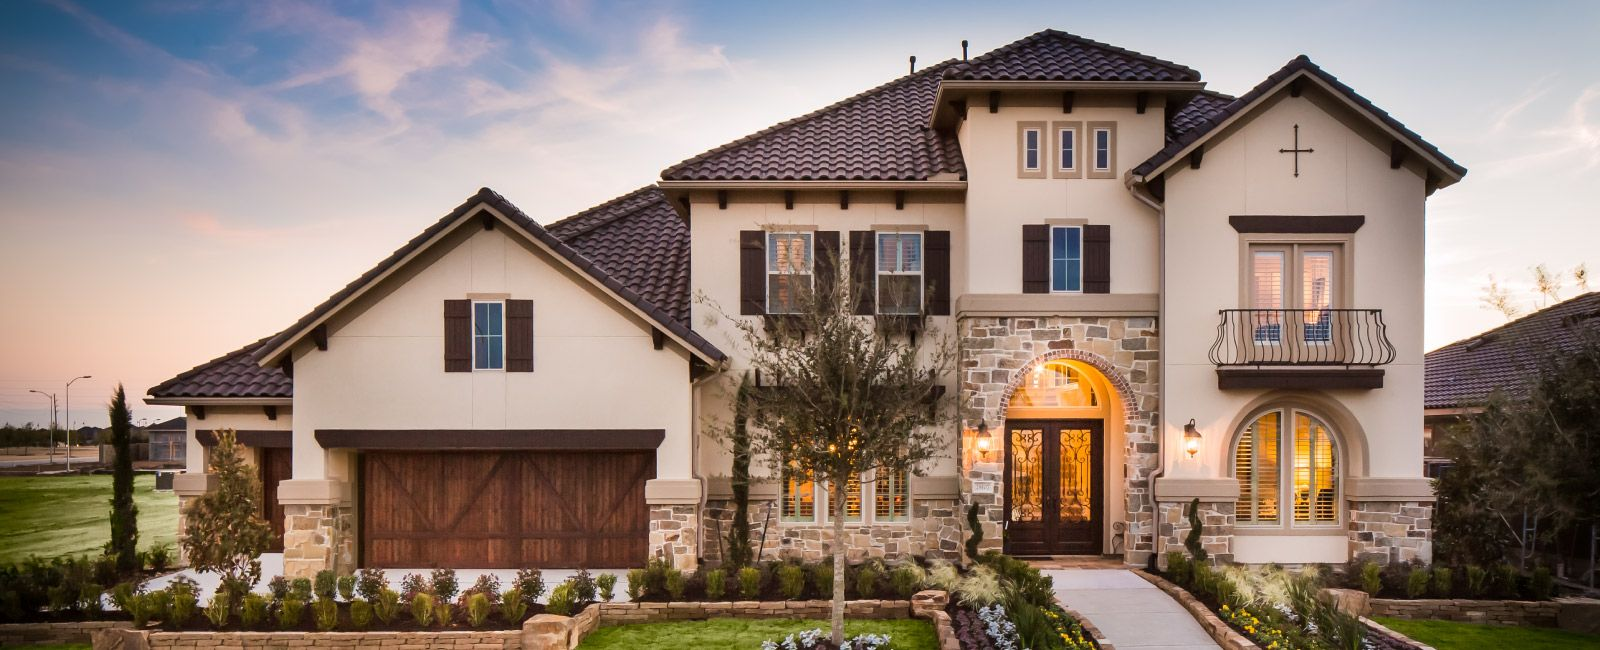 Single Family for Sale at Plan S162 28018 Starlight Harbor Ln Fulshear, Texas 77441 United States